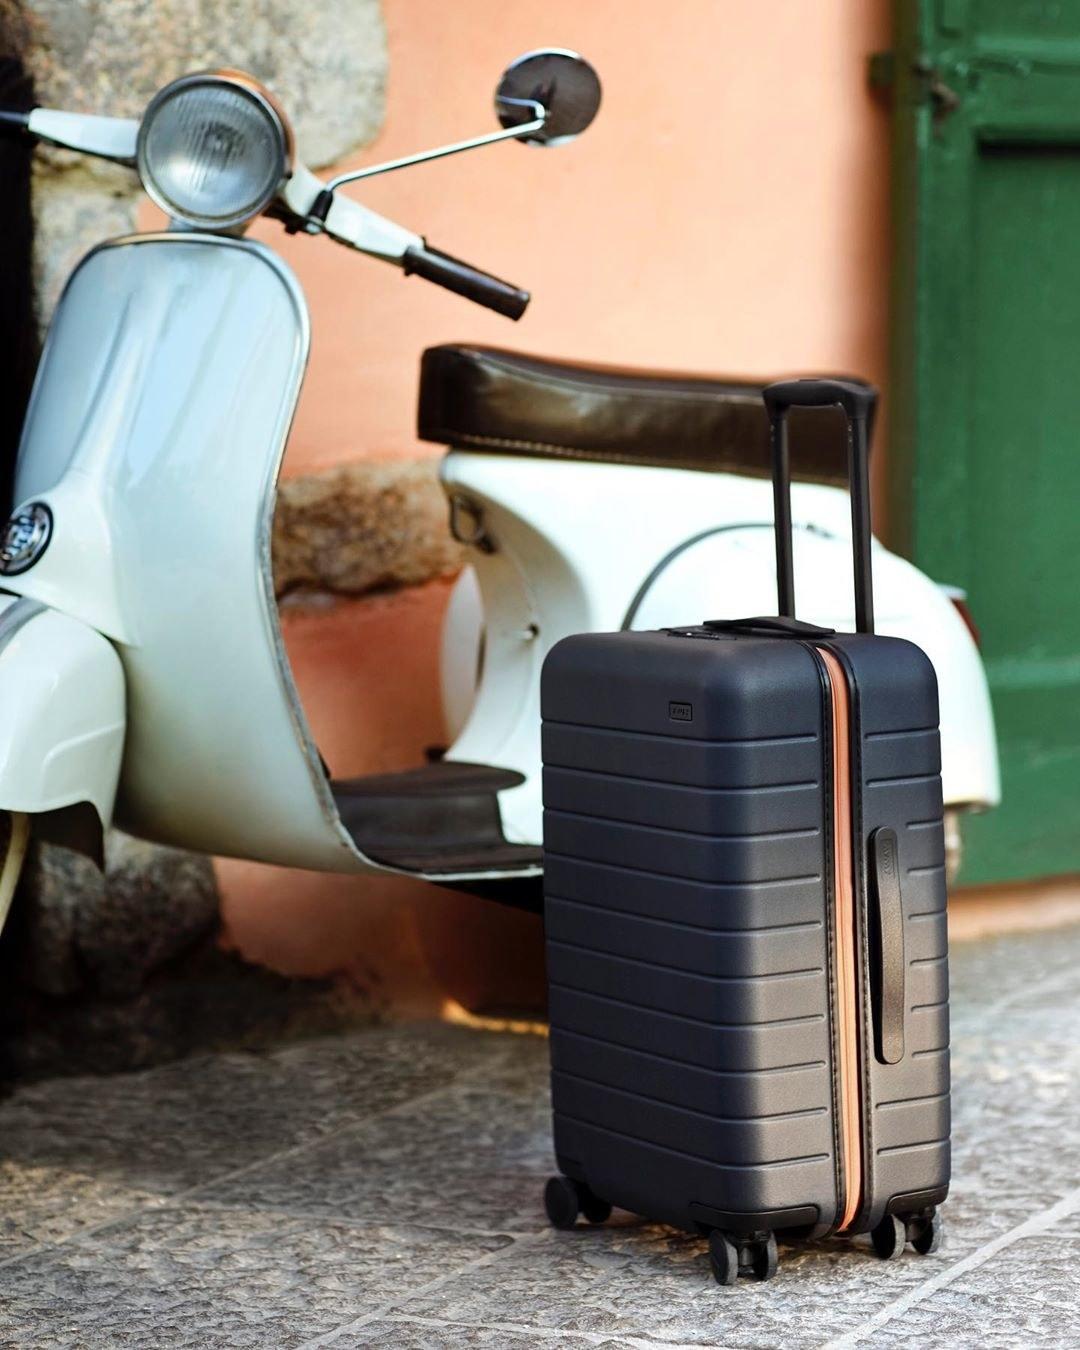 navy blue away suitcase next to a vespa